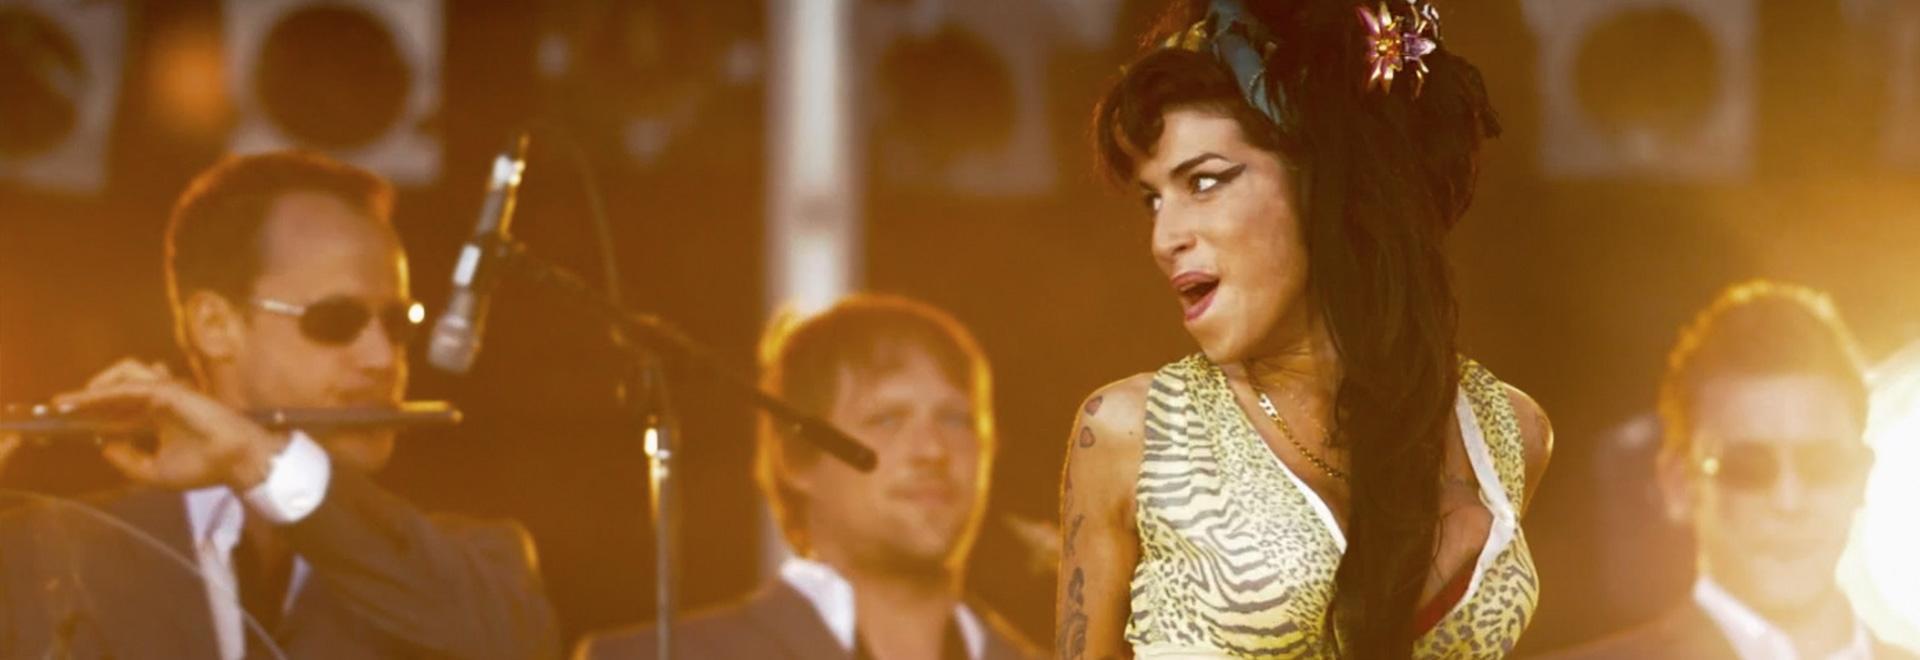 Amy Winehouse & Me: La storia di Dionne